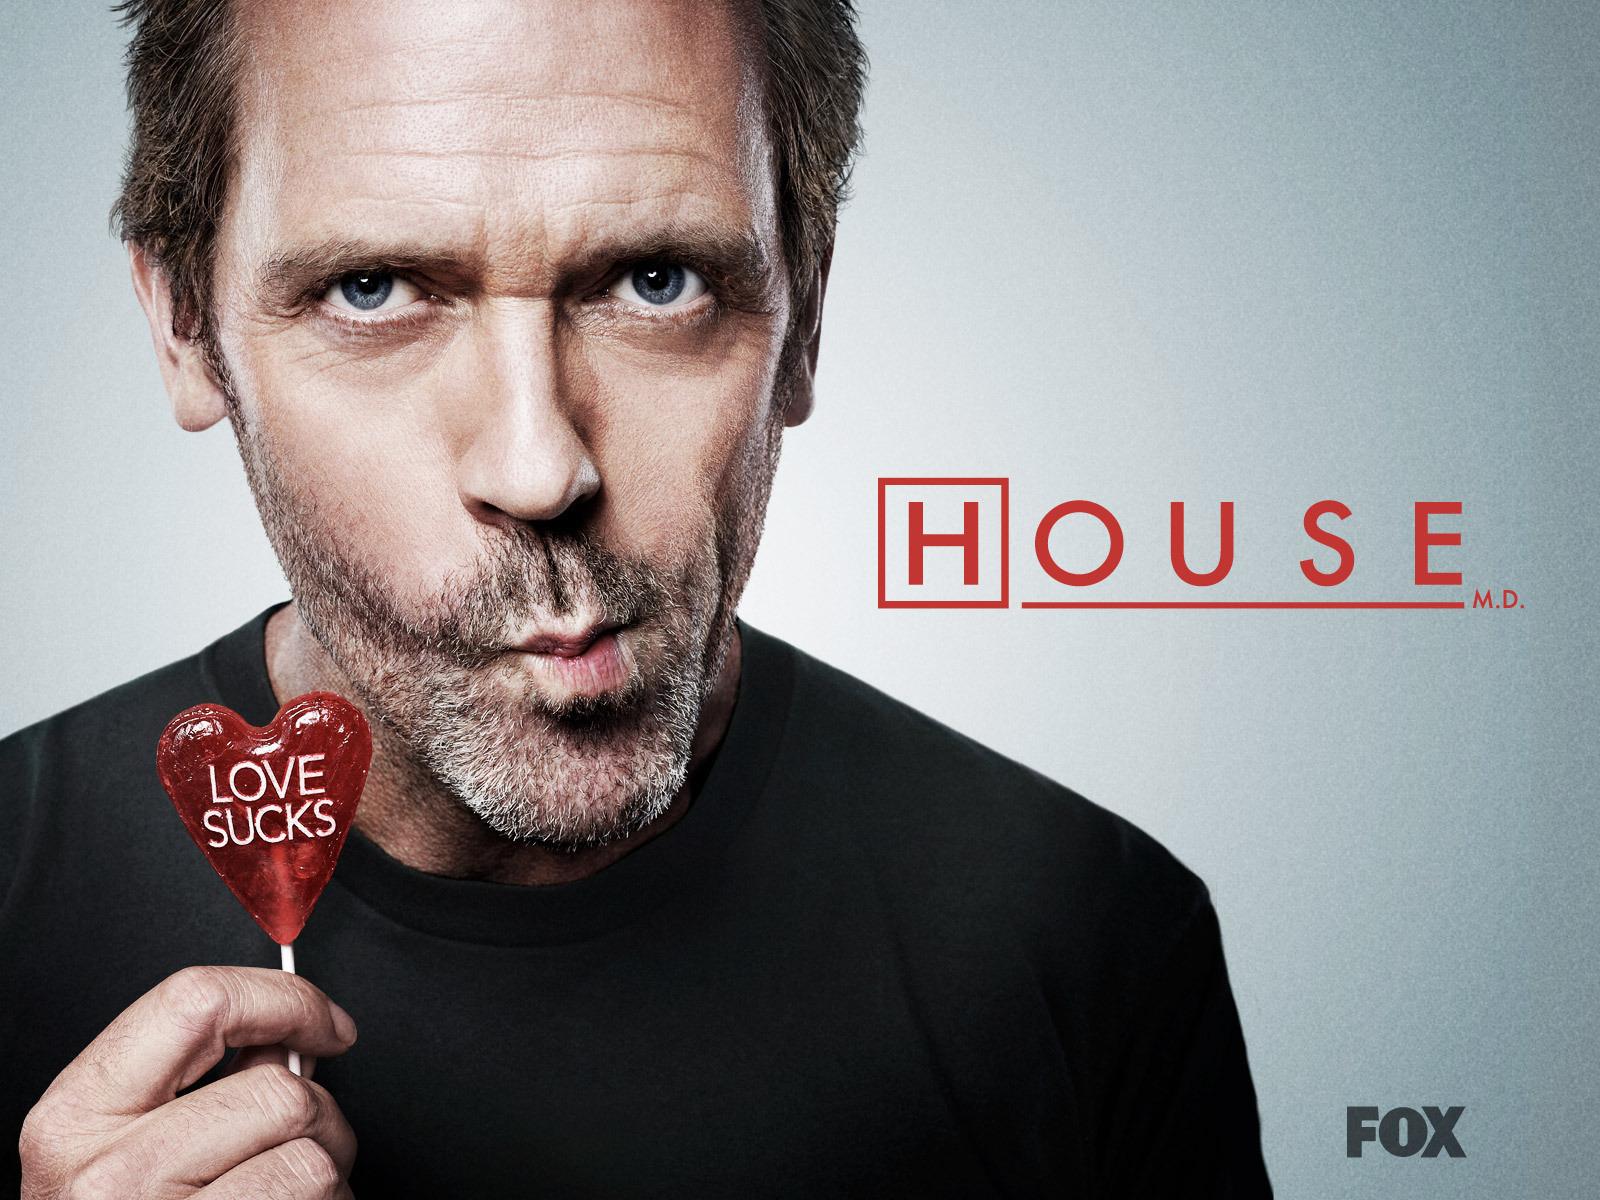 Dr House Netflix